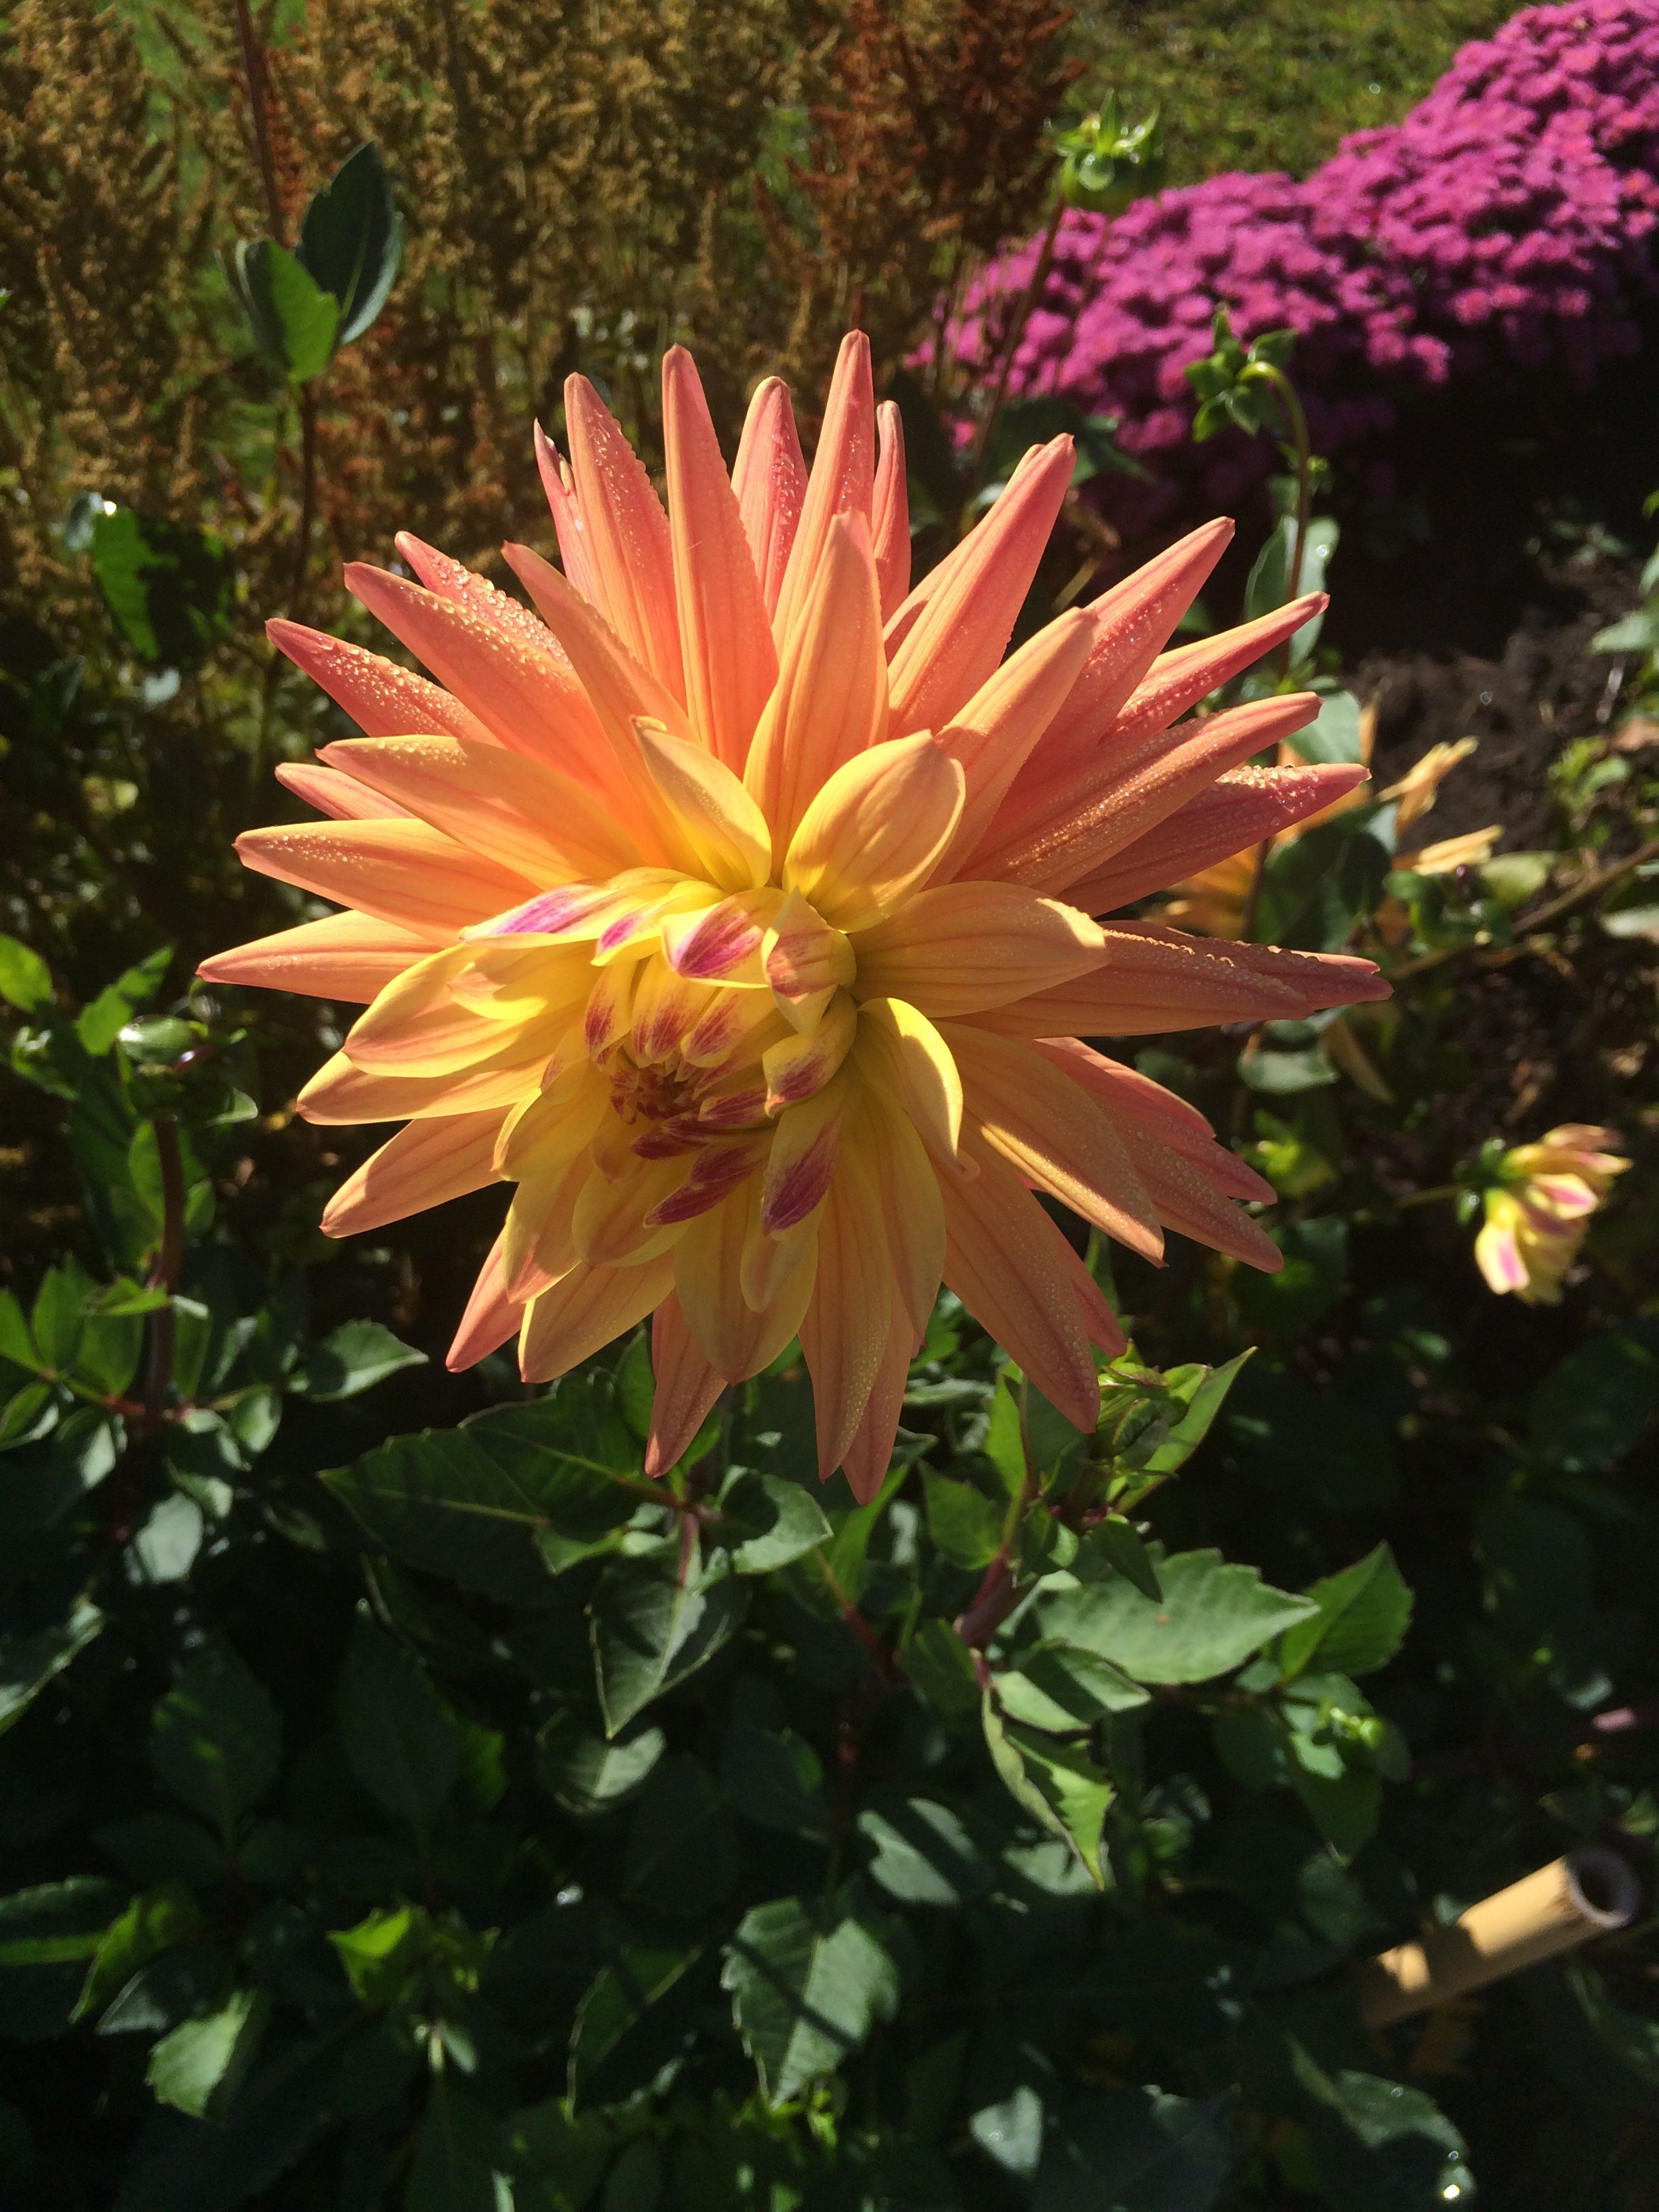 Fall in maine flower power plants flowers